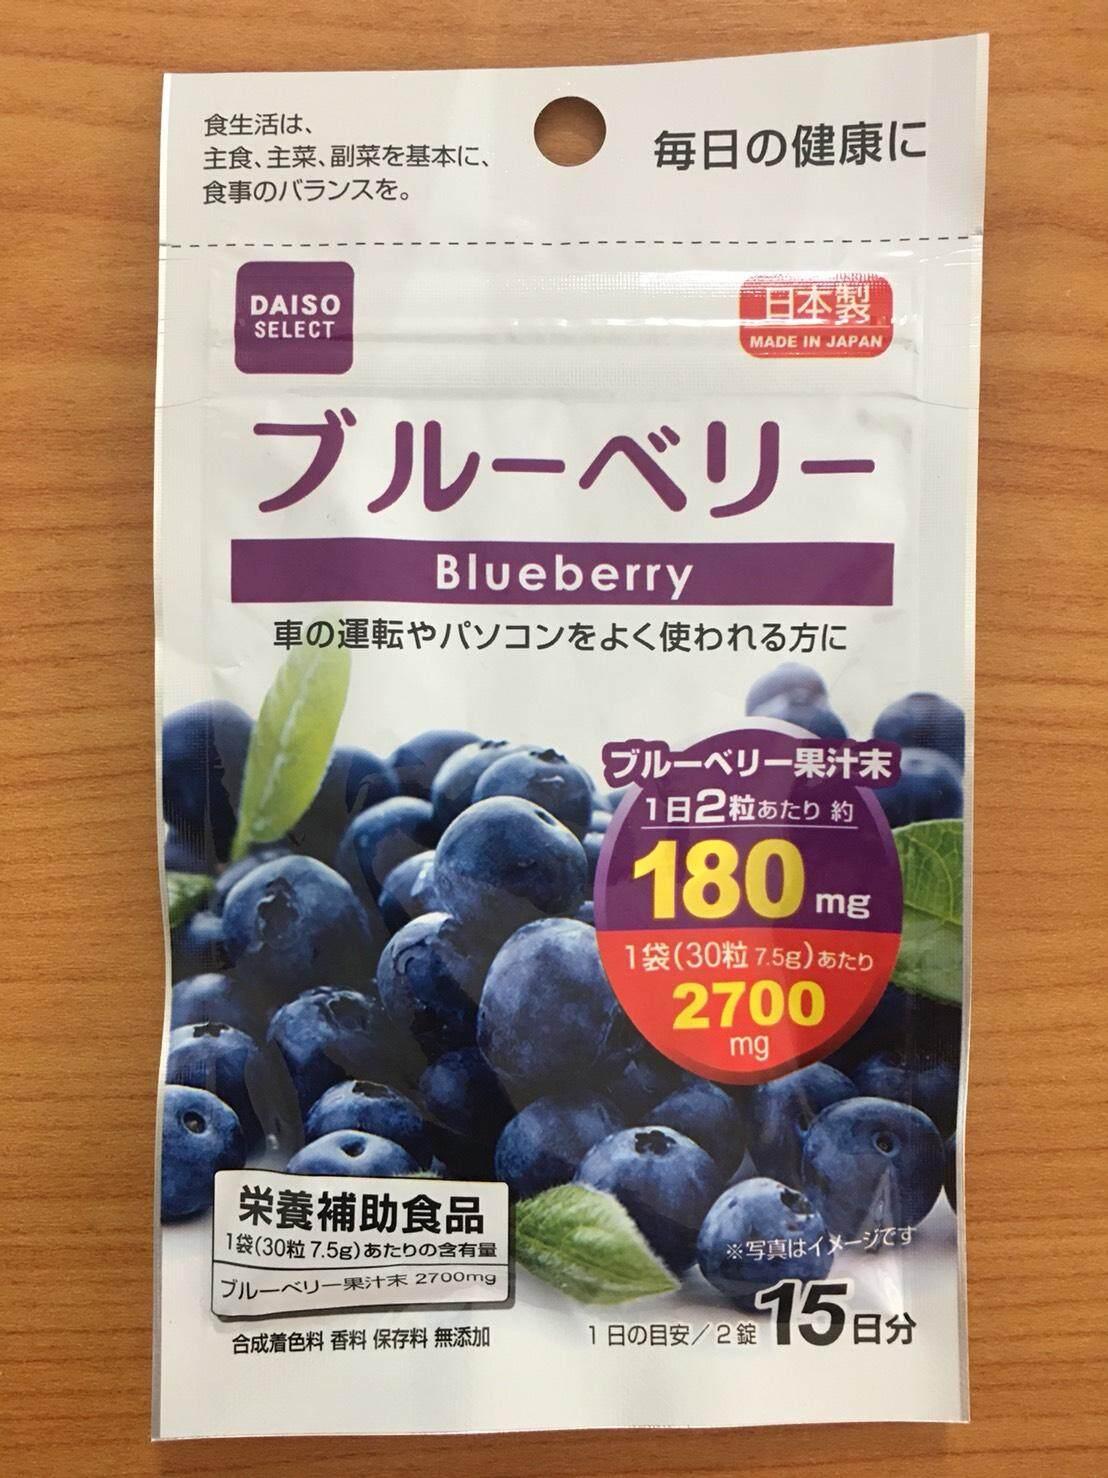 Daiso Blueberry Extract Vitamin บำรุงสายตา ช่วยลดการเกิดคอลเลสเตอรอล พร้อมบำรุงเซลล์ผิวหนัง 15 วัน ( 1 ซอง ) By A-Best.